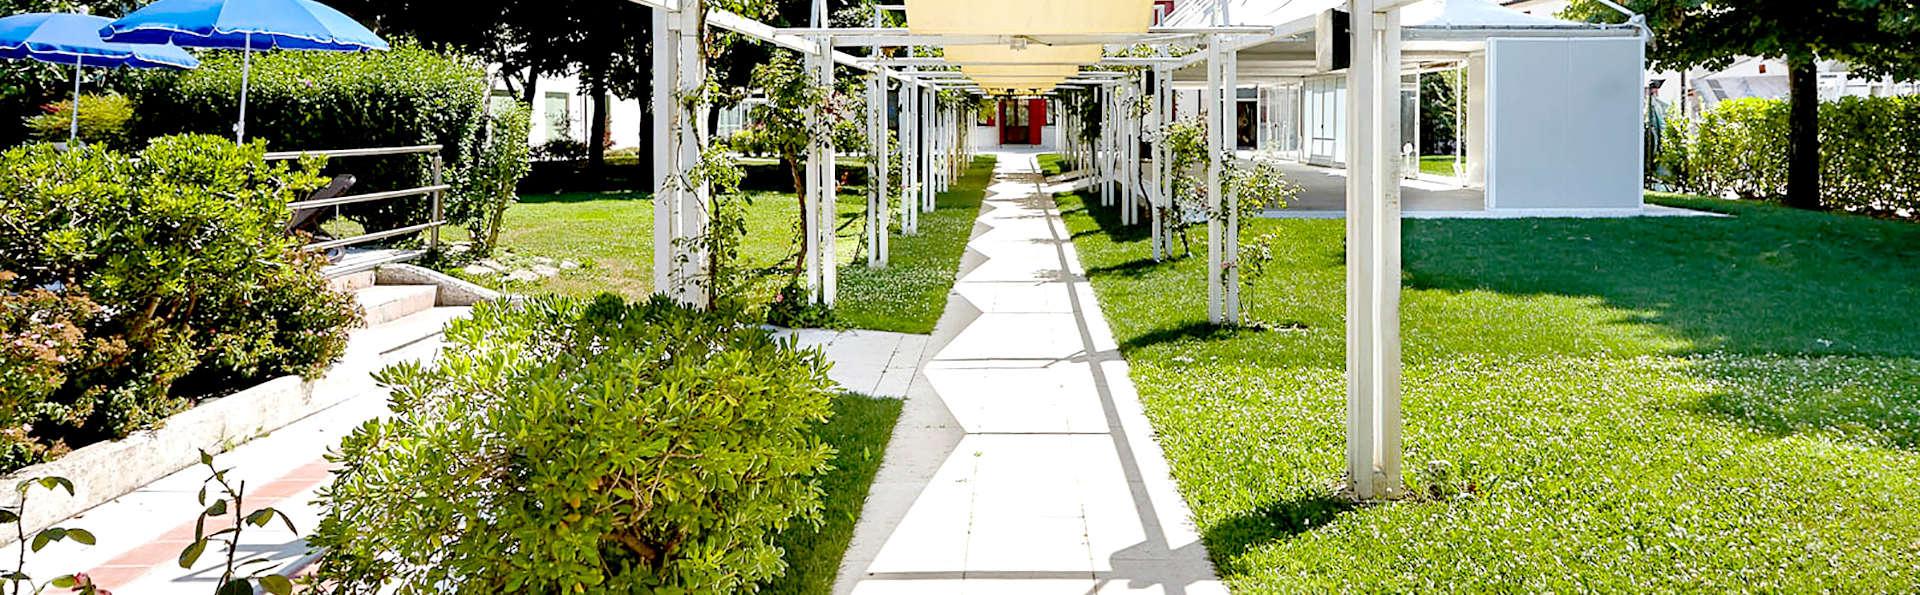 Villa Patriarca Hotel - Edit_Garden2.jpg